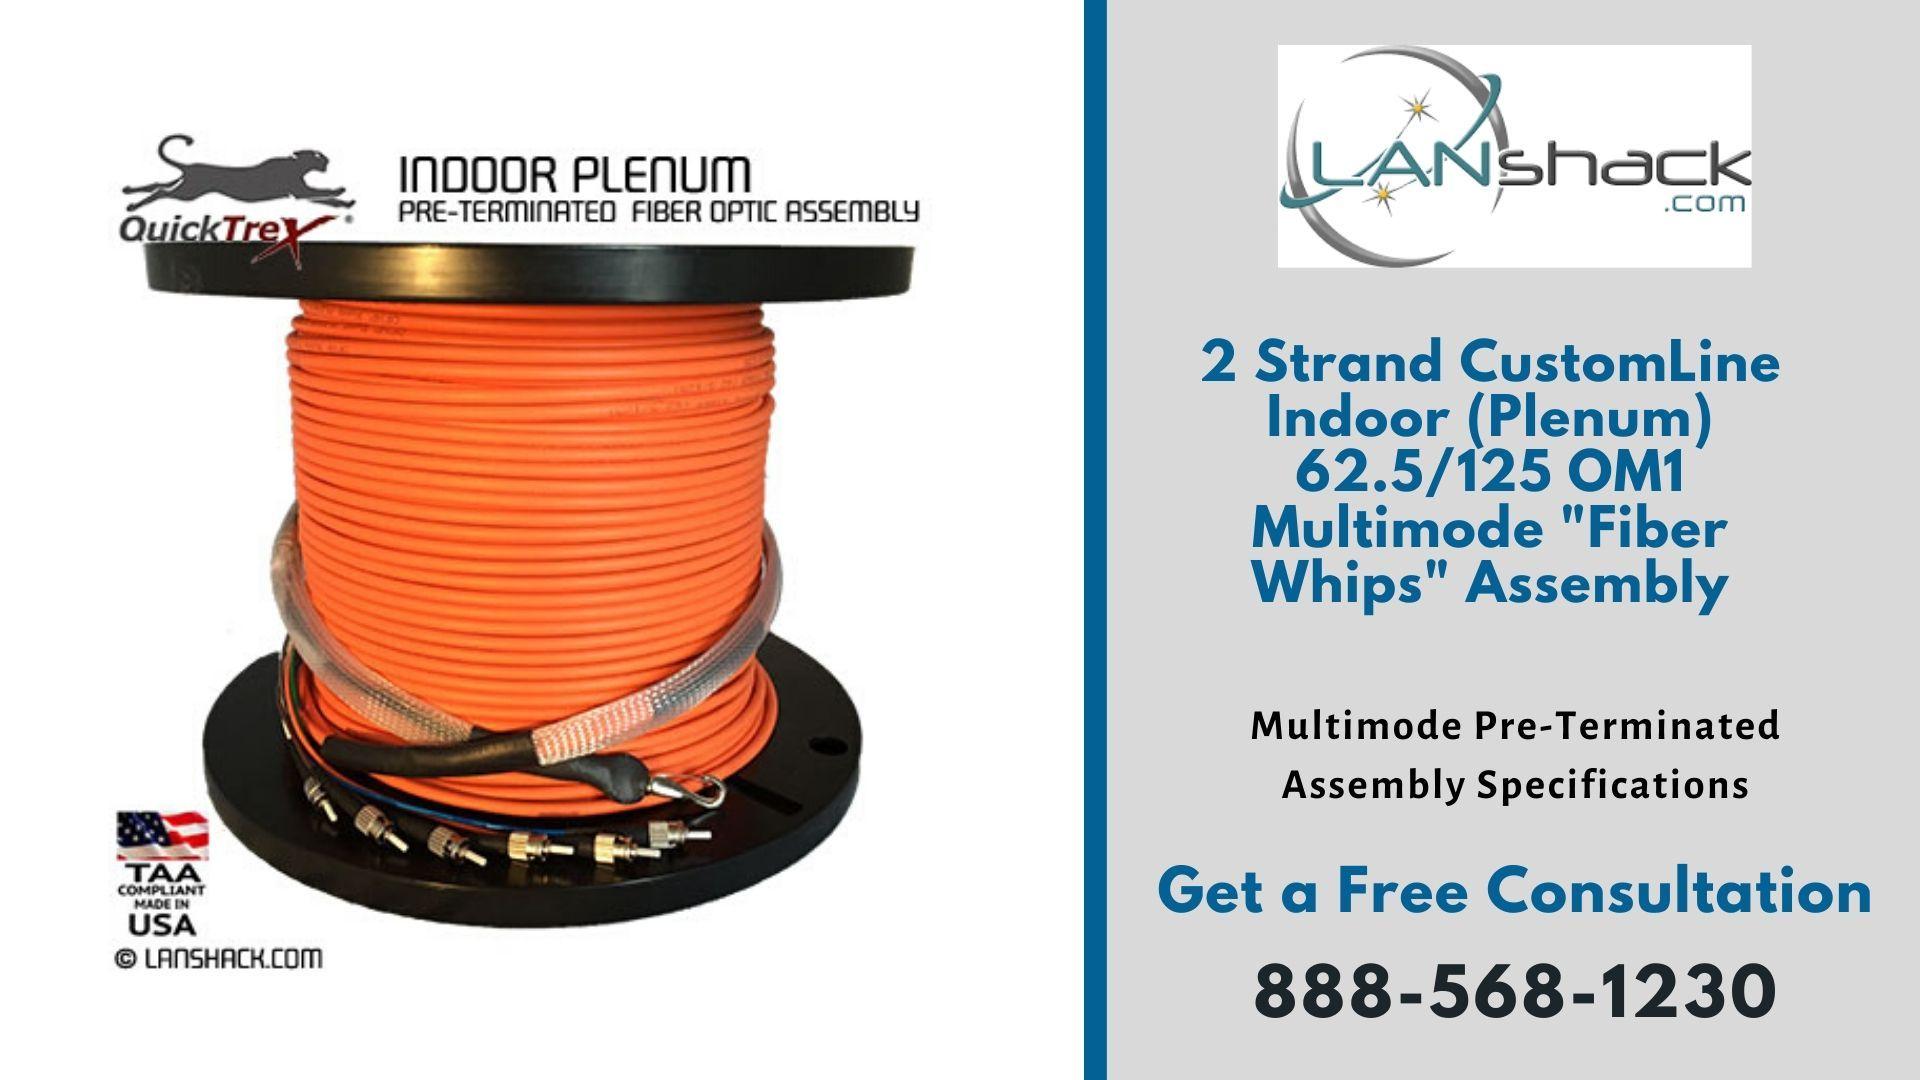 Indoor Plenum Pre Terminated Assembly In 2020 Fiber Optic Cable Fiber Optic Optical